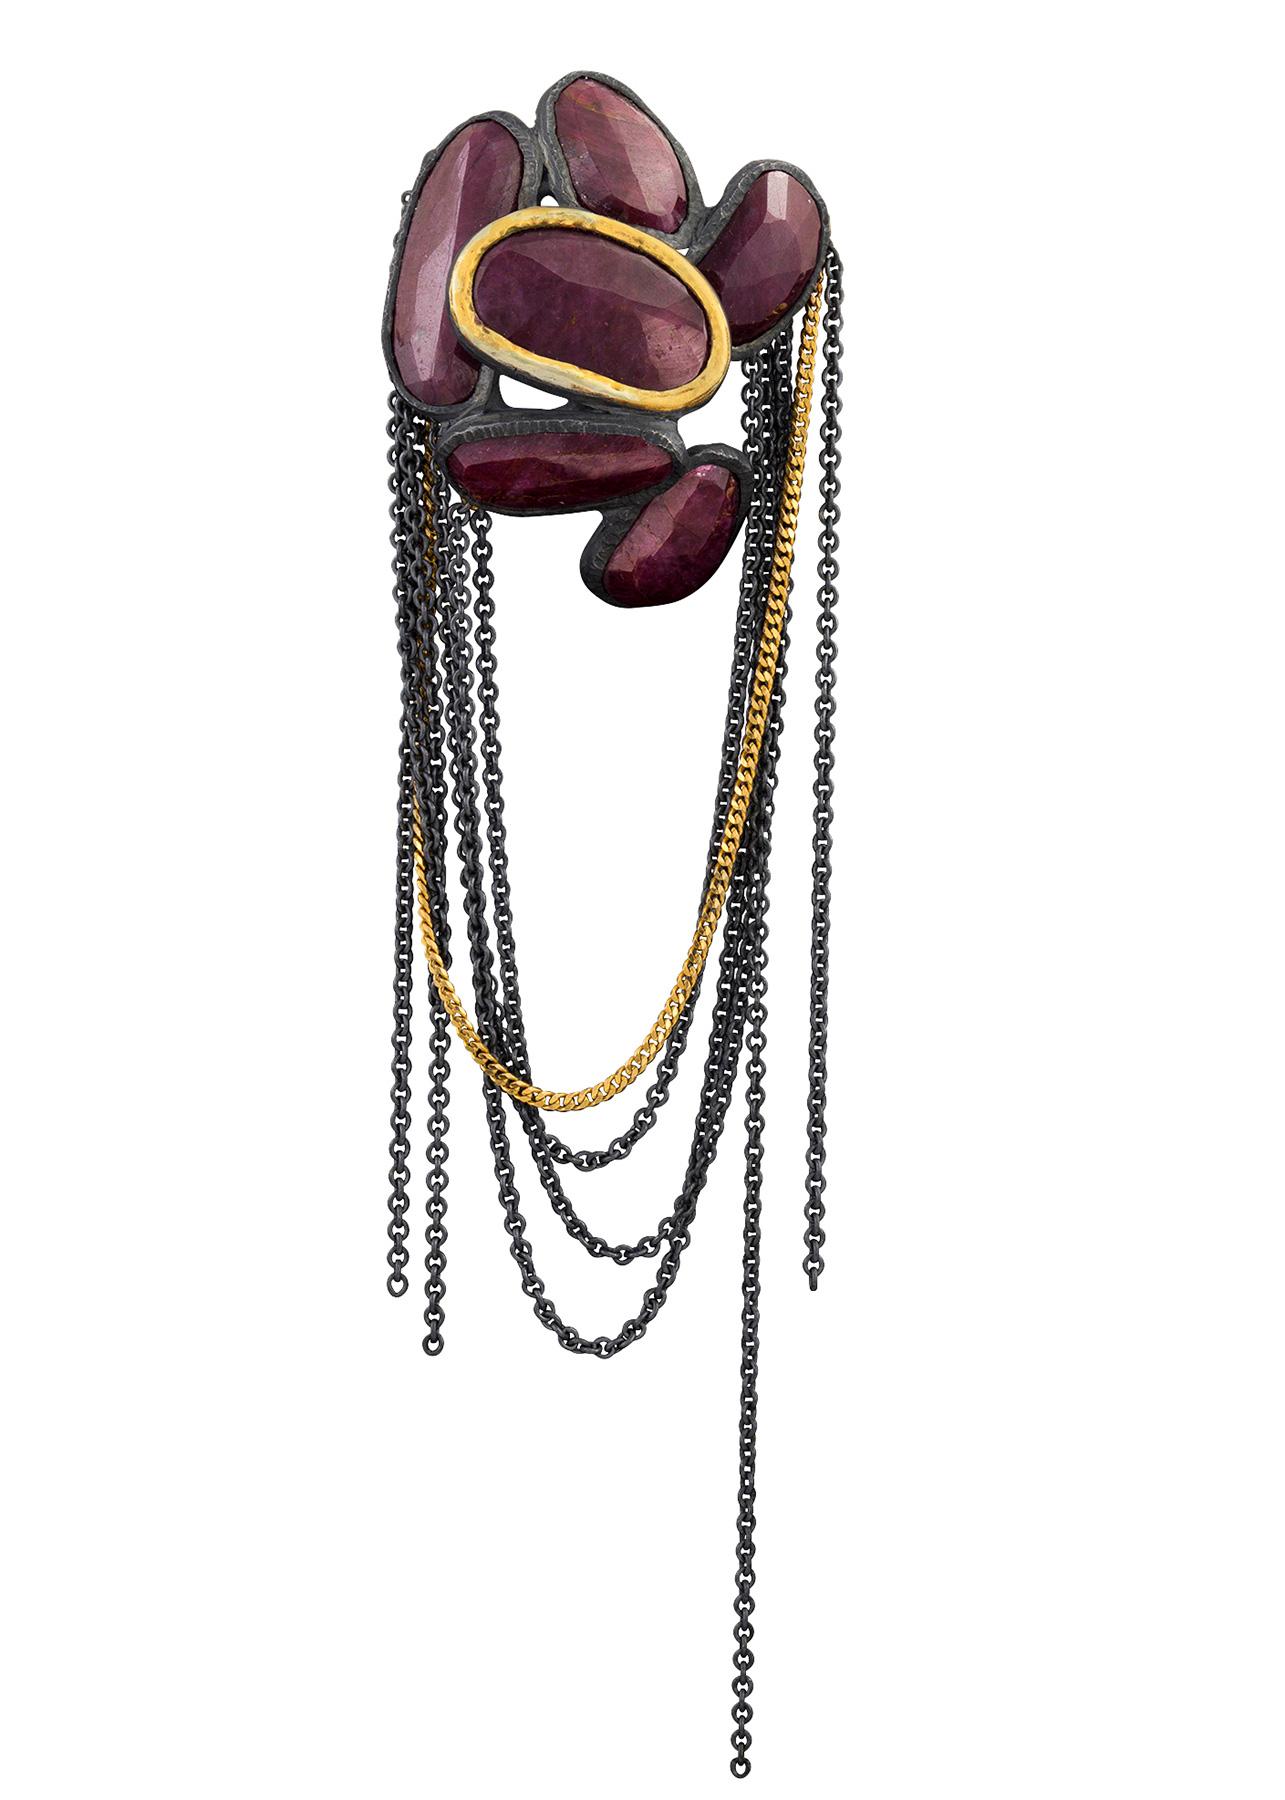 Shaya.Durbin.Ruby.Tassel.Brooch - Shaya Durbin.jpg